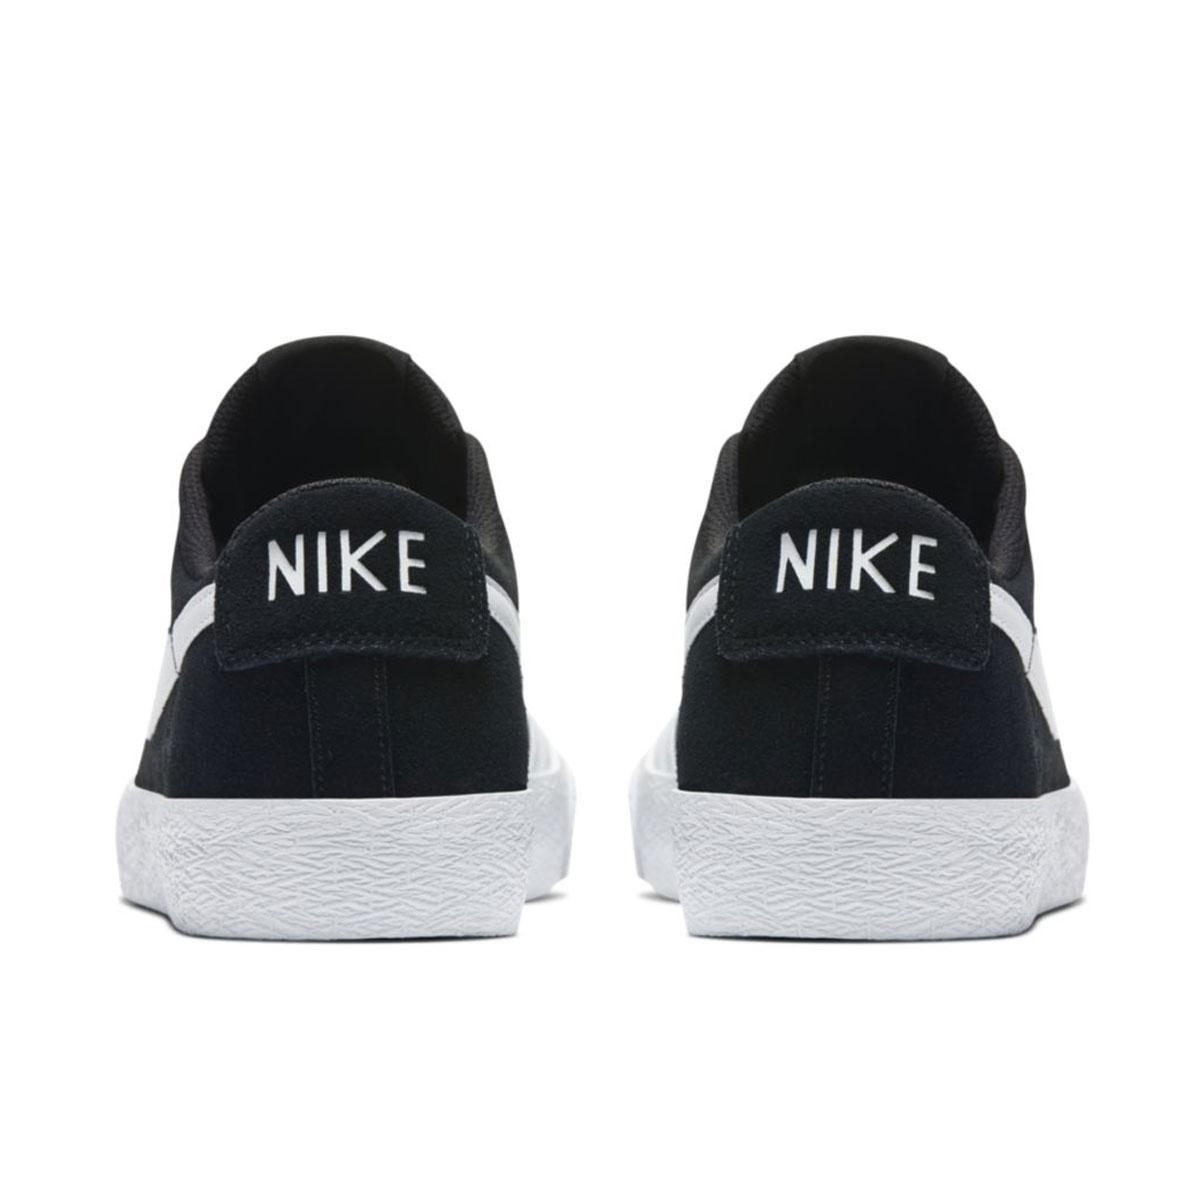 17e23f7dfdcf3b NIKE SB BLAZER ZOOM LOW XT (Nike Nike SB ブレーザーズームロー XT) BLACK WHITE-GUM  LIGHT BROWN-WHITE 17HO-I